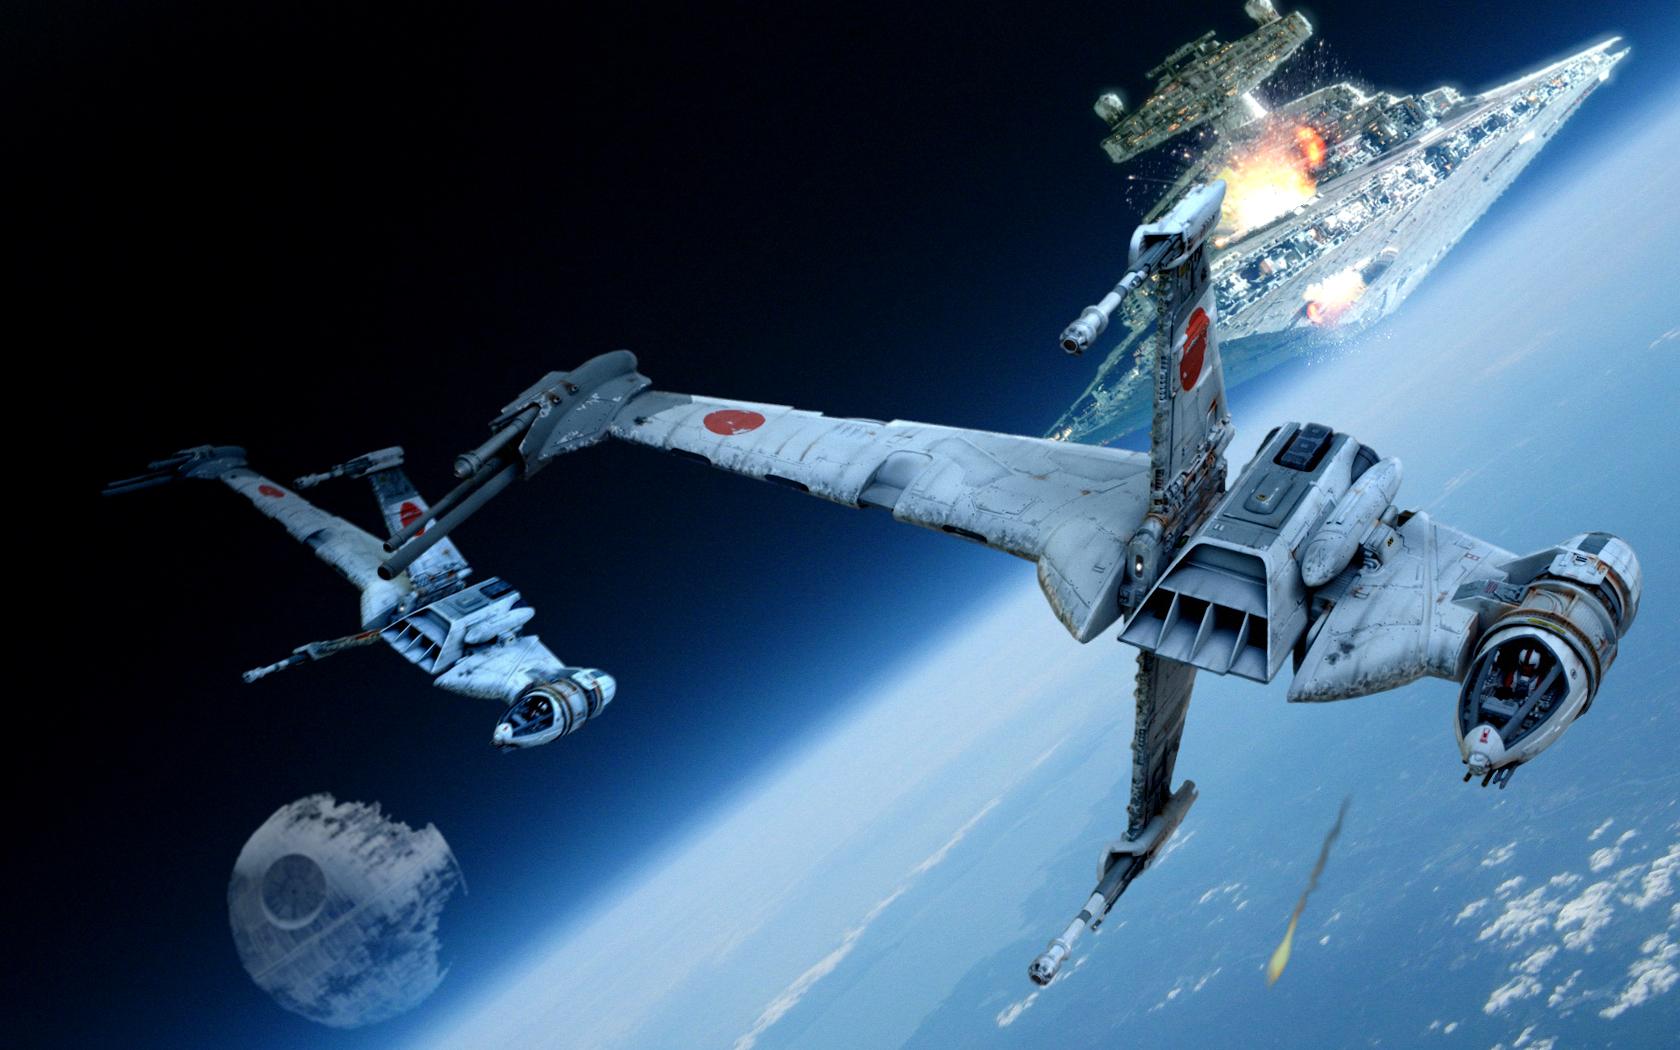 Wallpaper Star Wars Asymmetrical Ships 1680x1050 Wallpaper Teahub Io